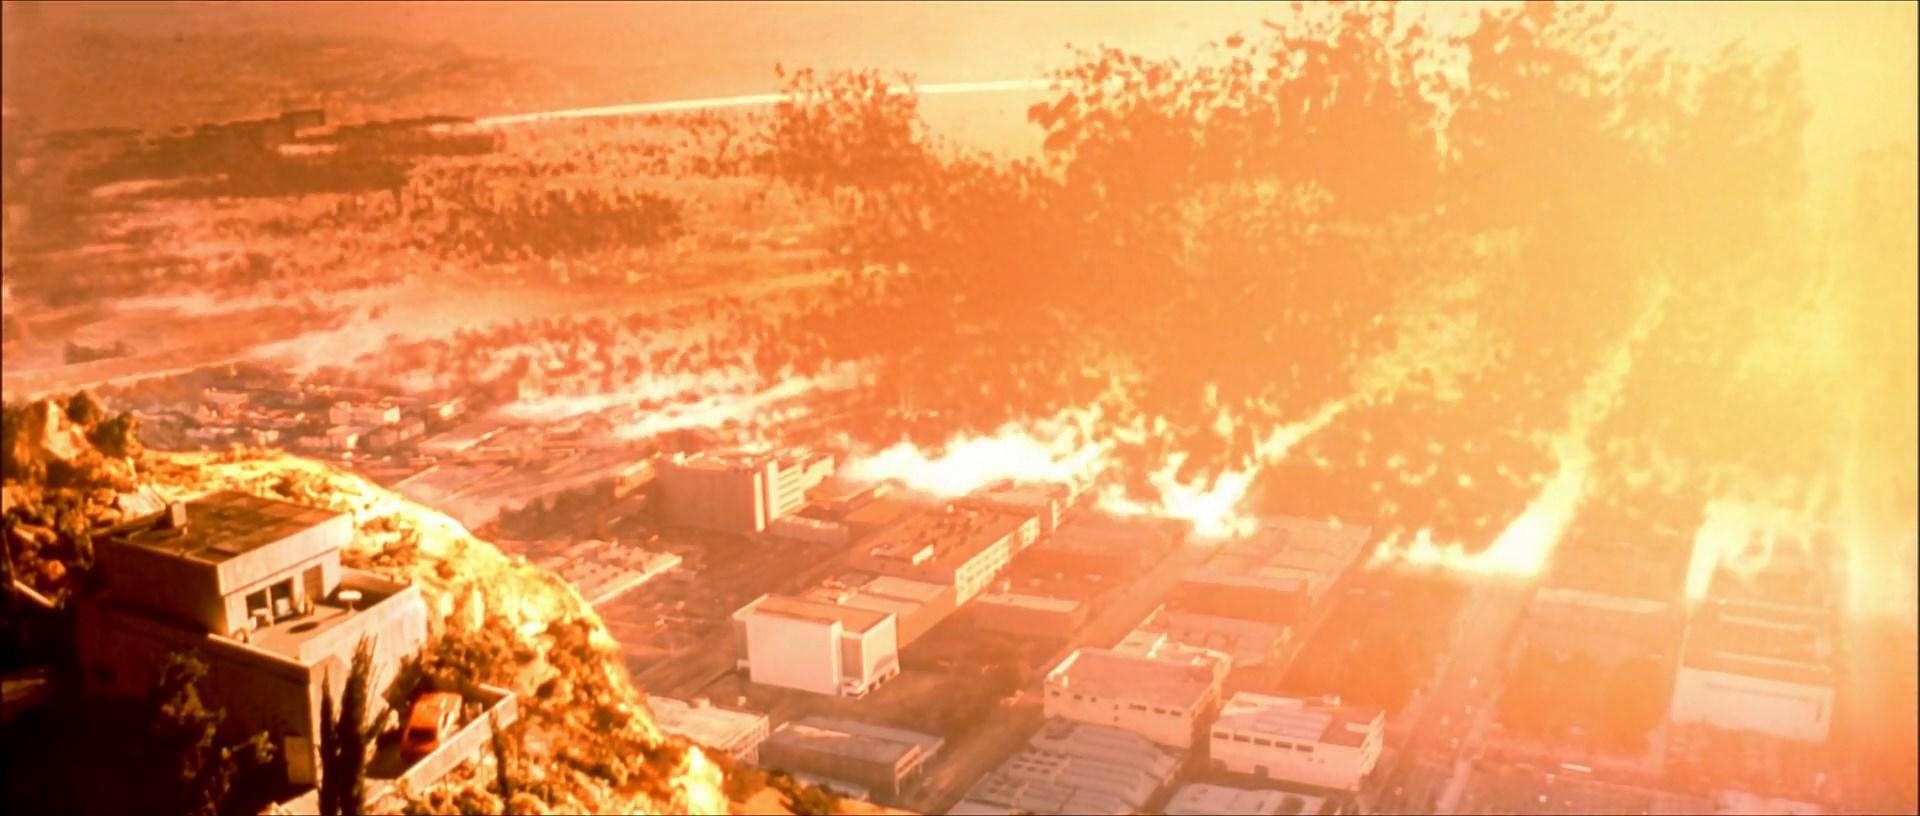 Term2nukeexplosion.jpg